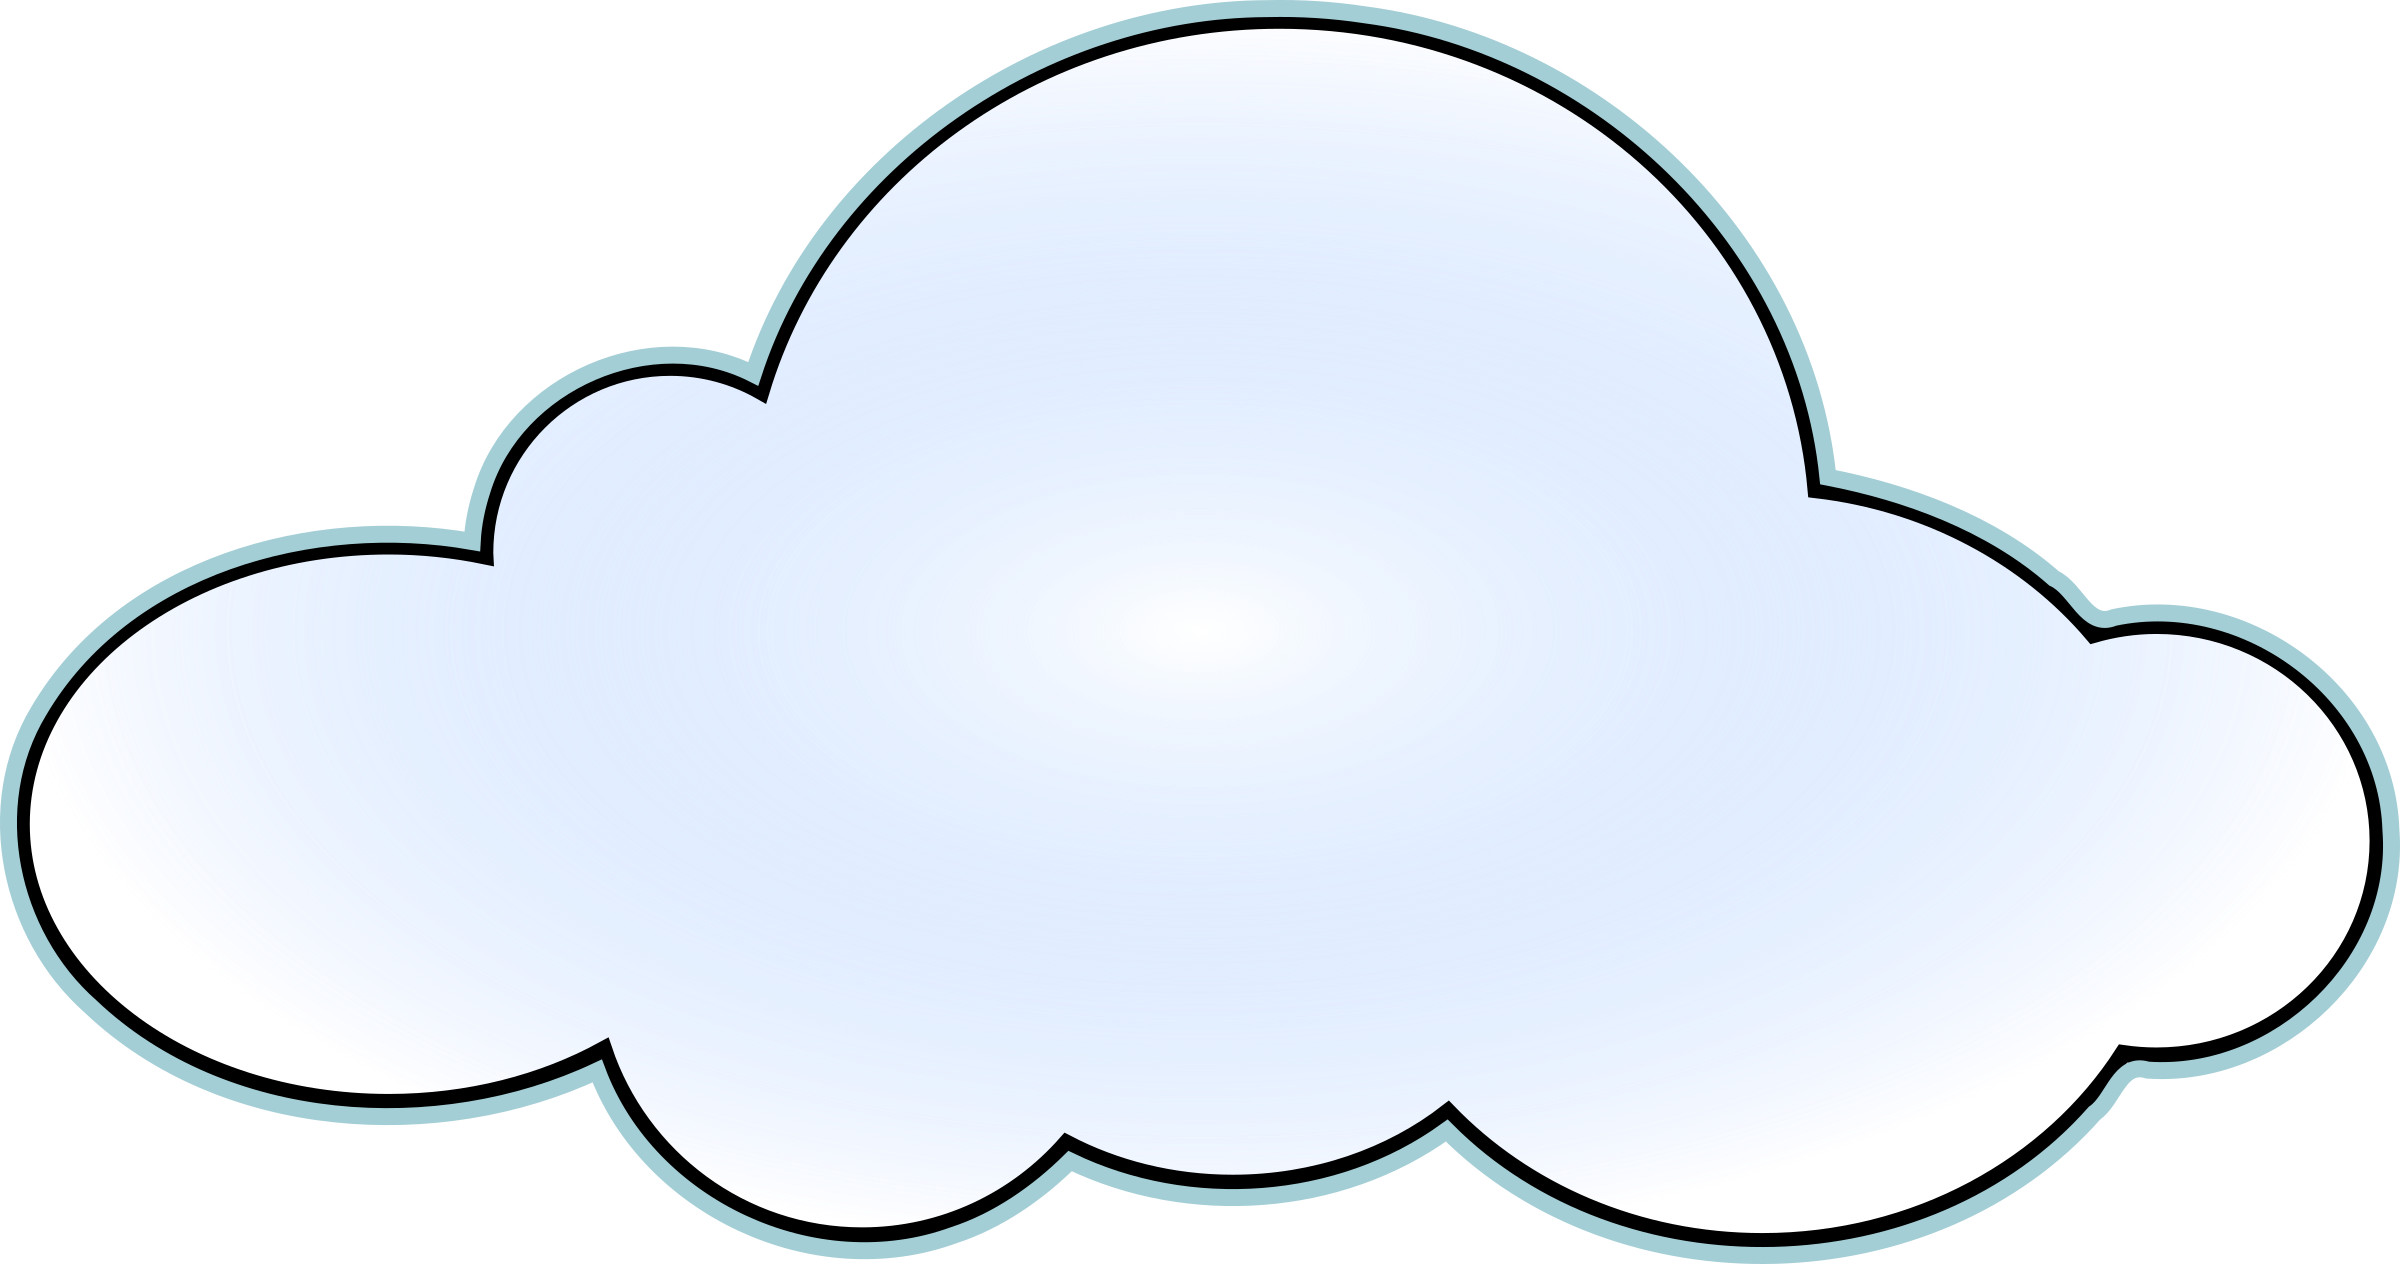 Cloud clipart visio, Cloud visio Transparent FREE for ...